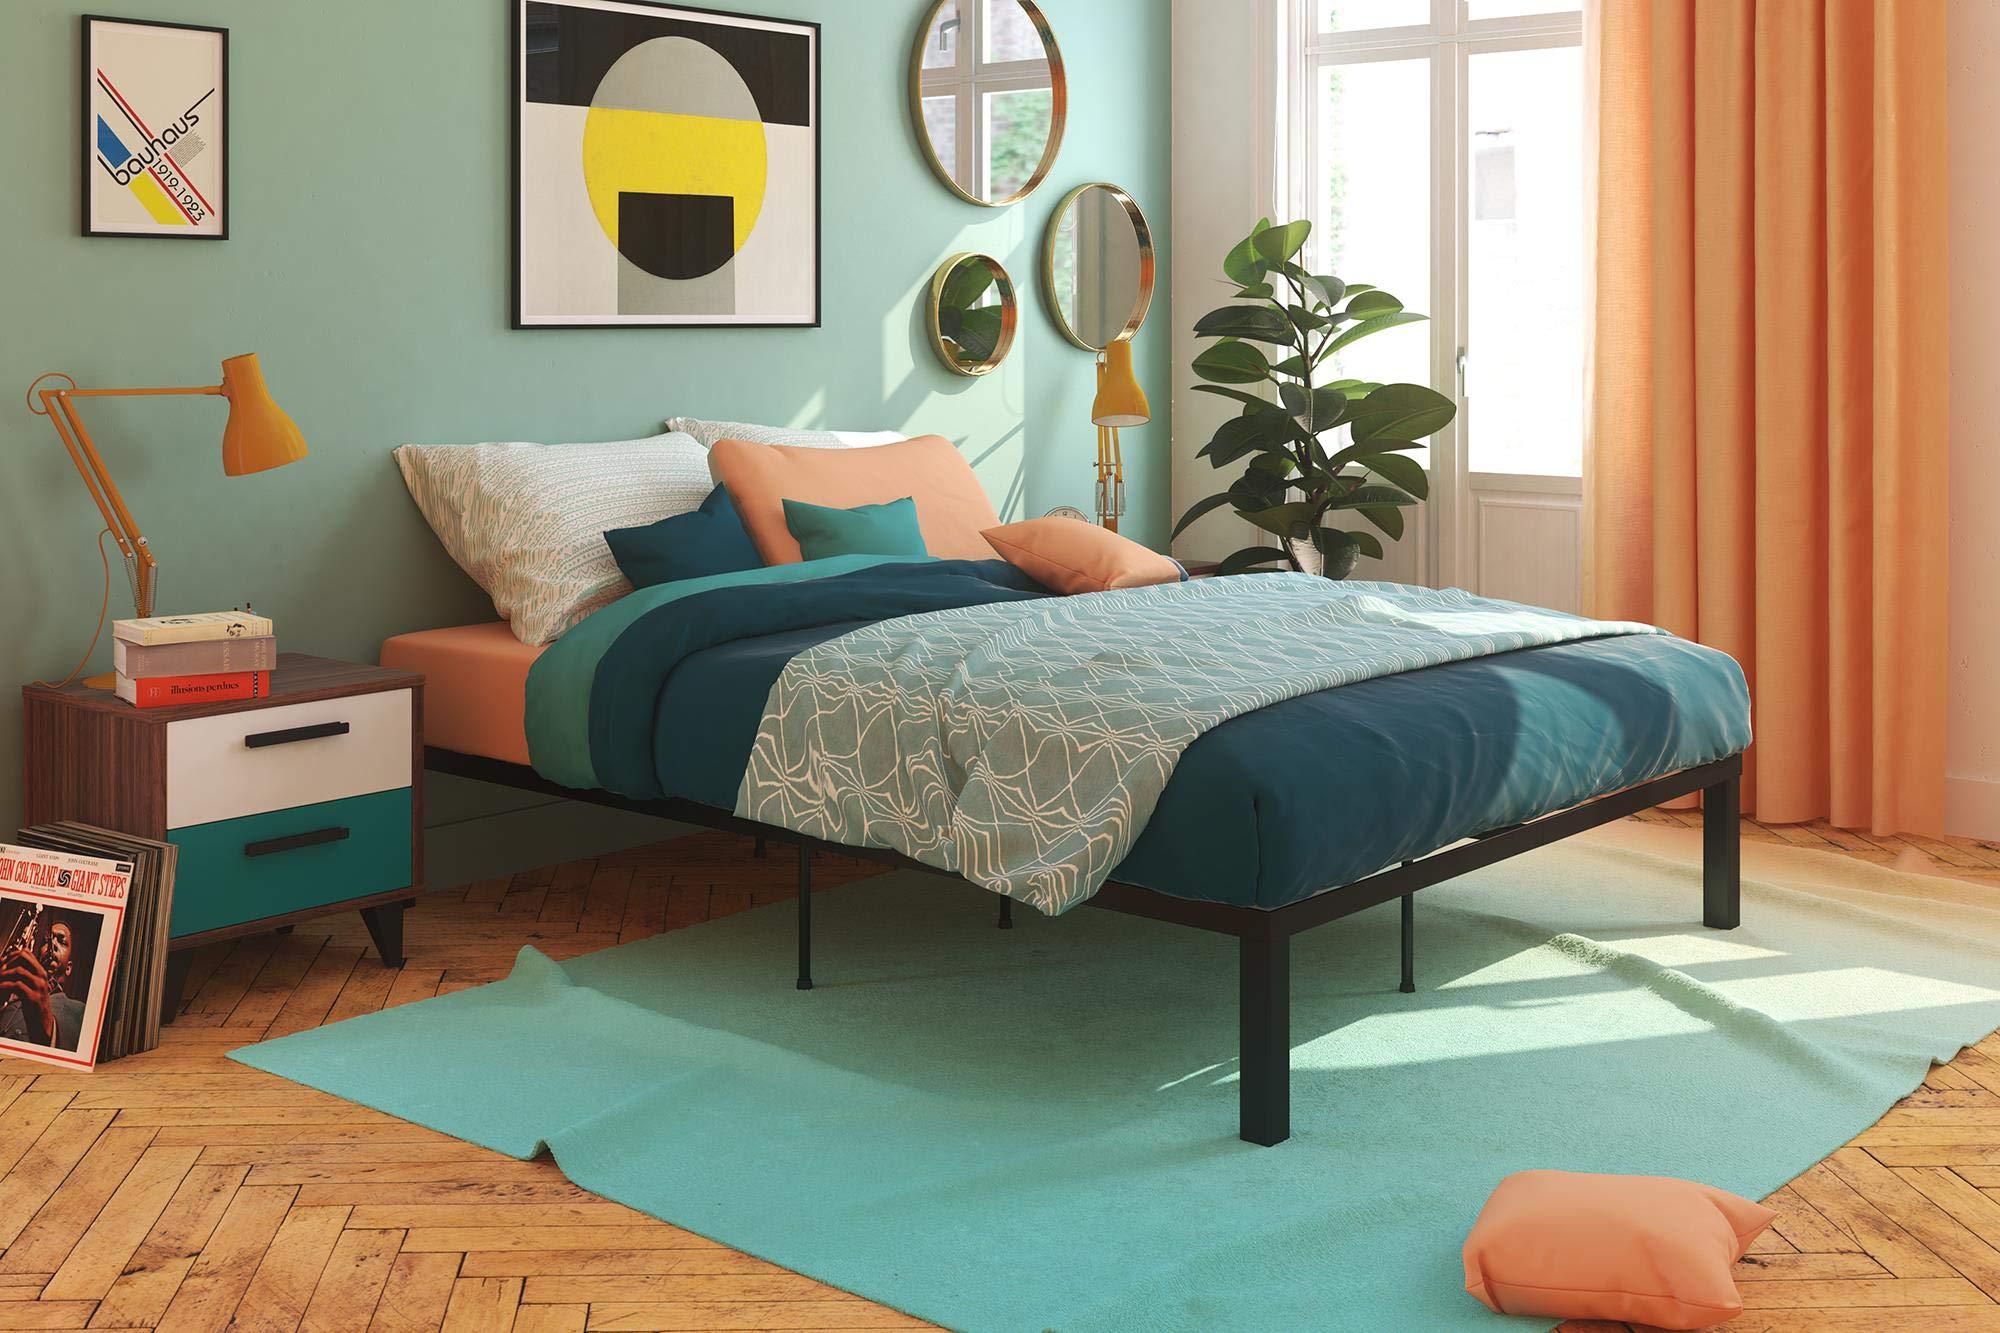 Signature Sleep DZ51122 Ultra Comfort Platform Euro Wood Slats: Queen Black Bed with Storage